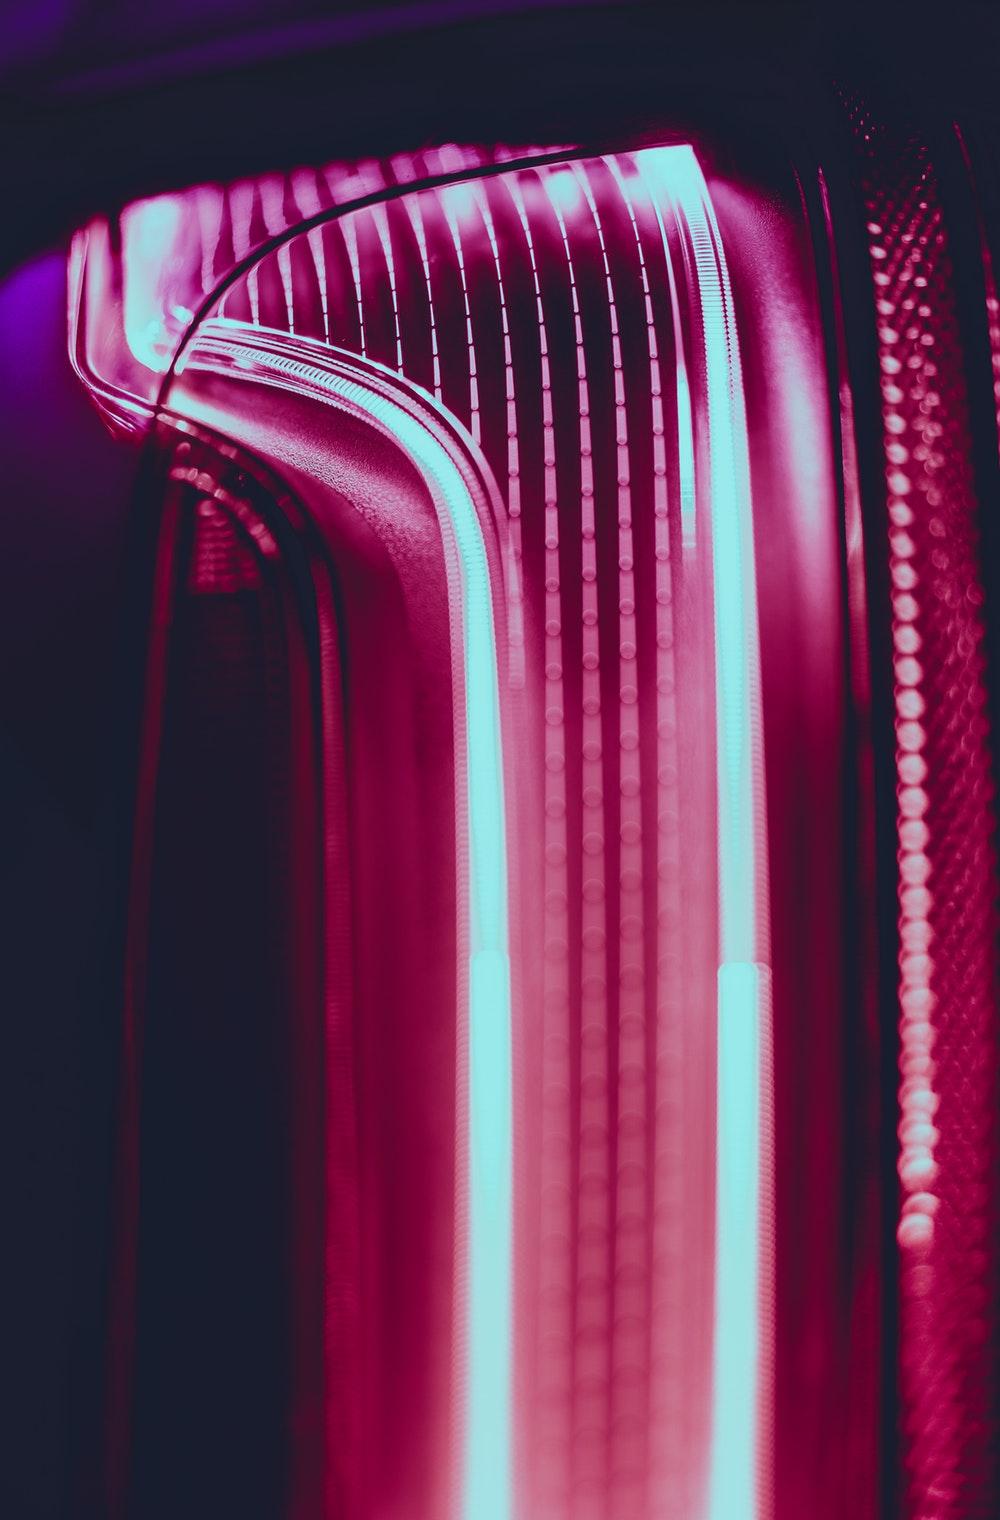 NEON | 100+ best free neon, sign, light, and neon sign photos on Unsplash